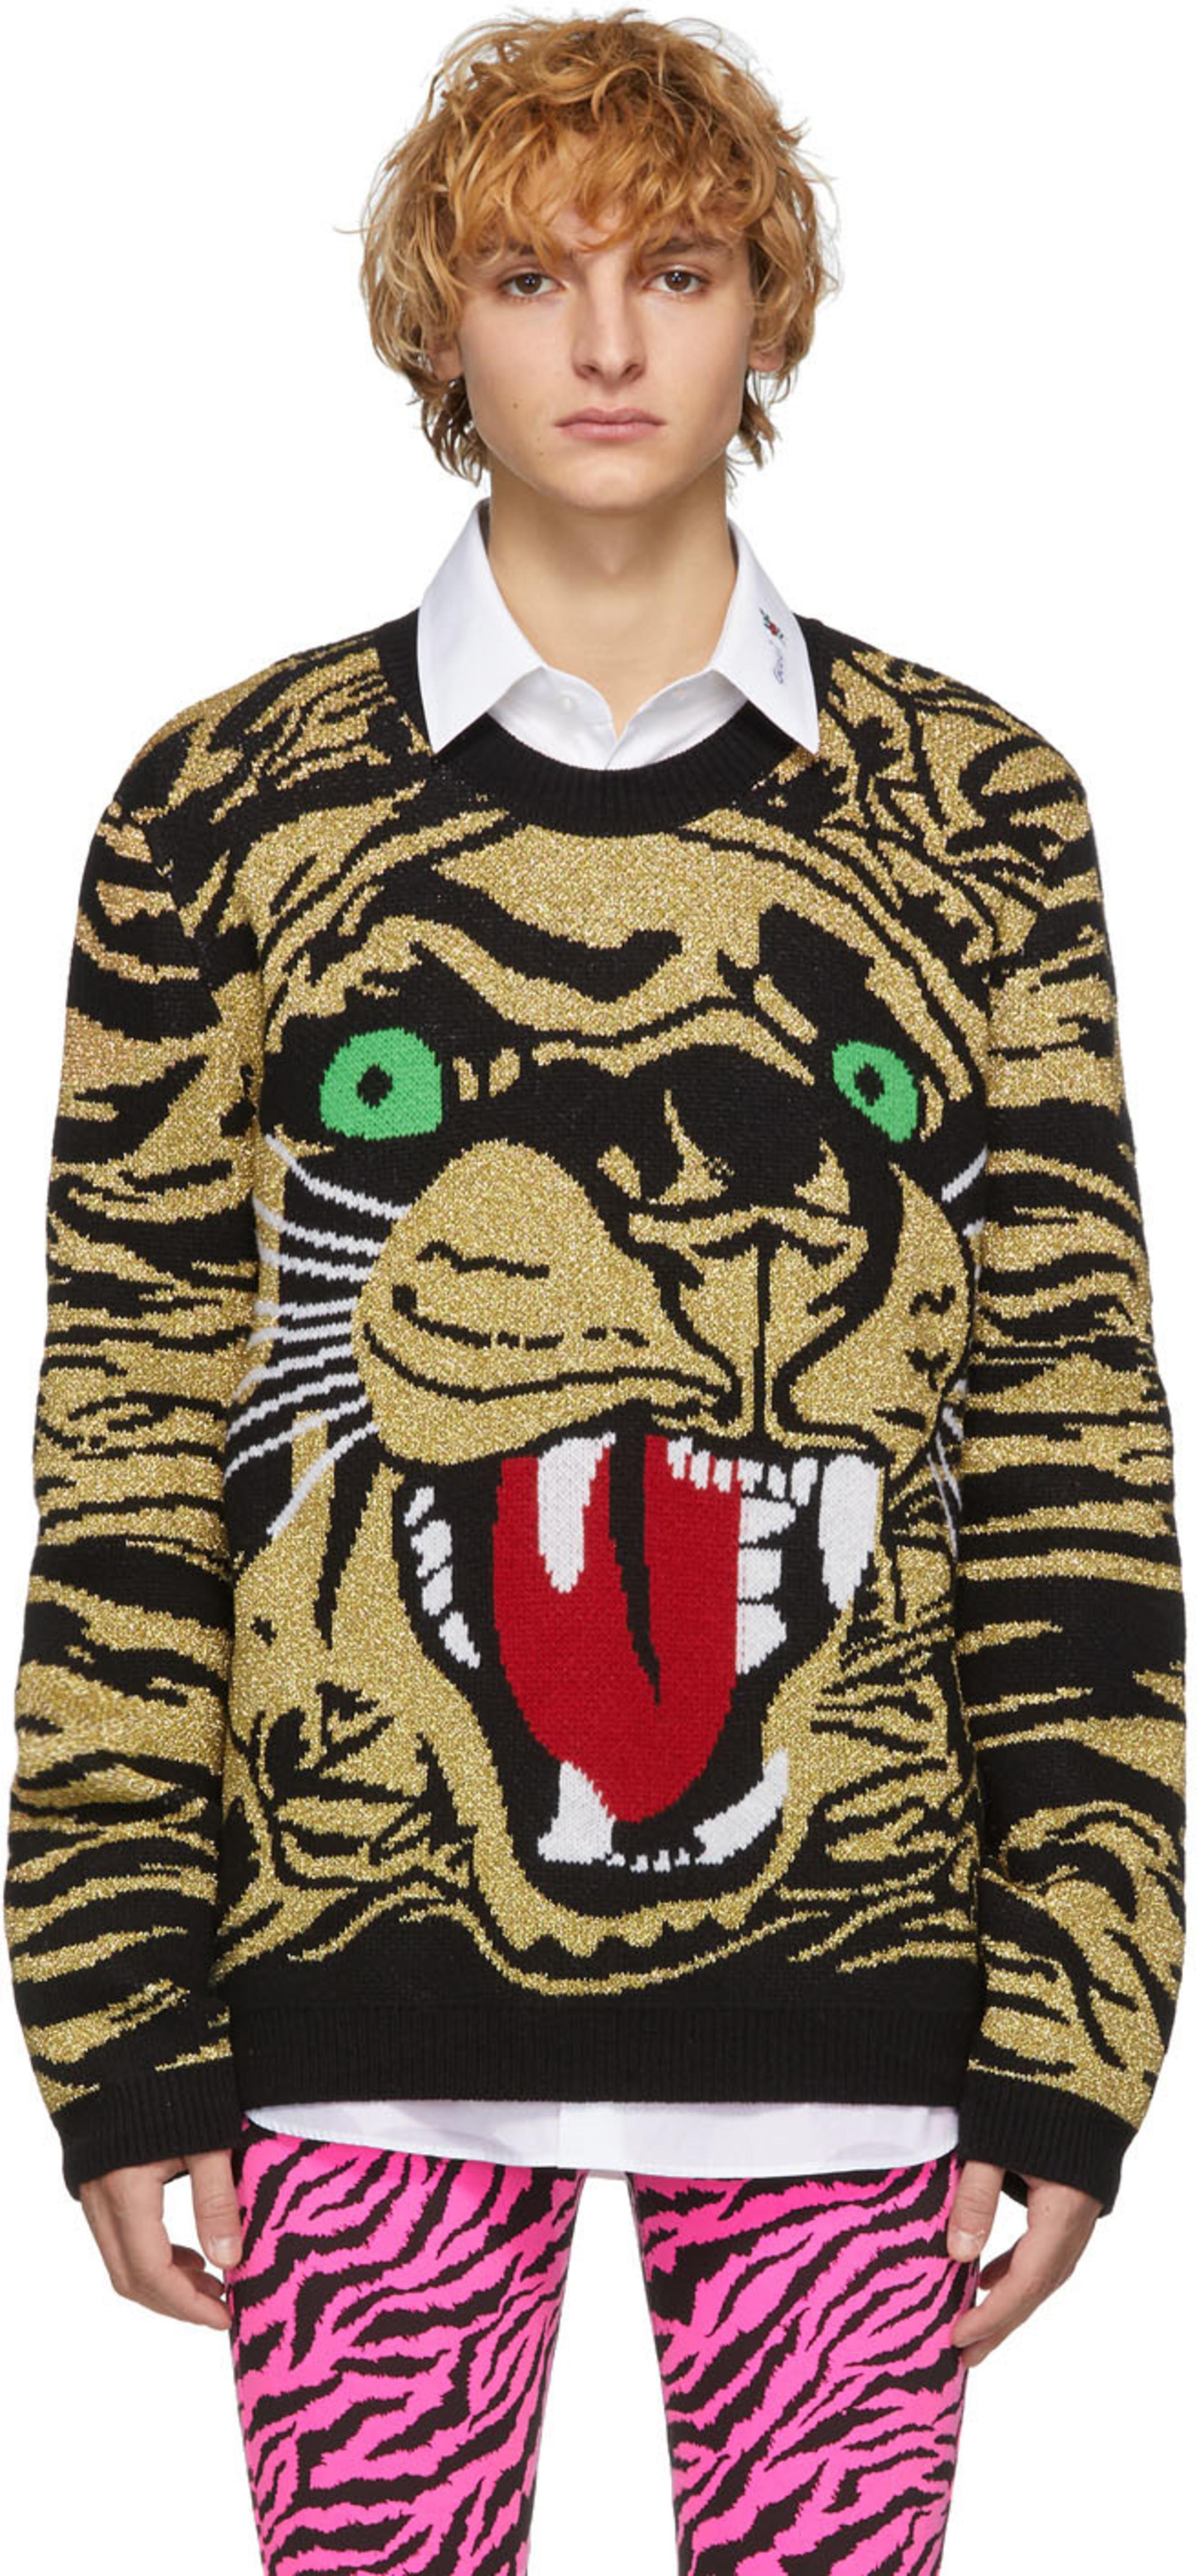 81f0557b5ead Gucci sweaters for Men